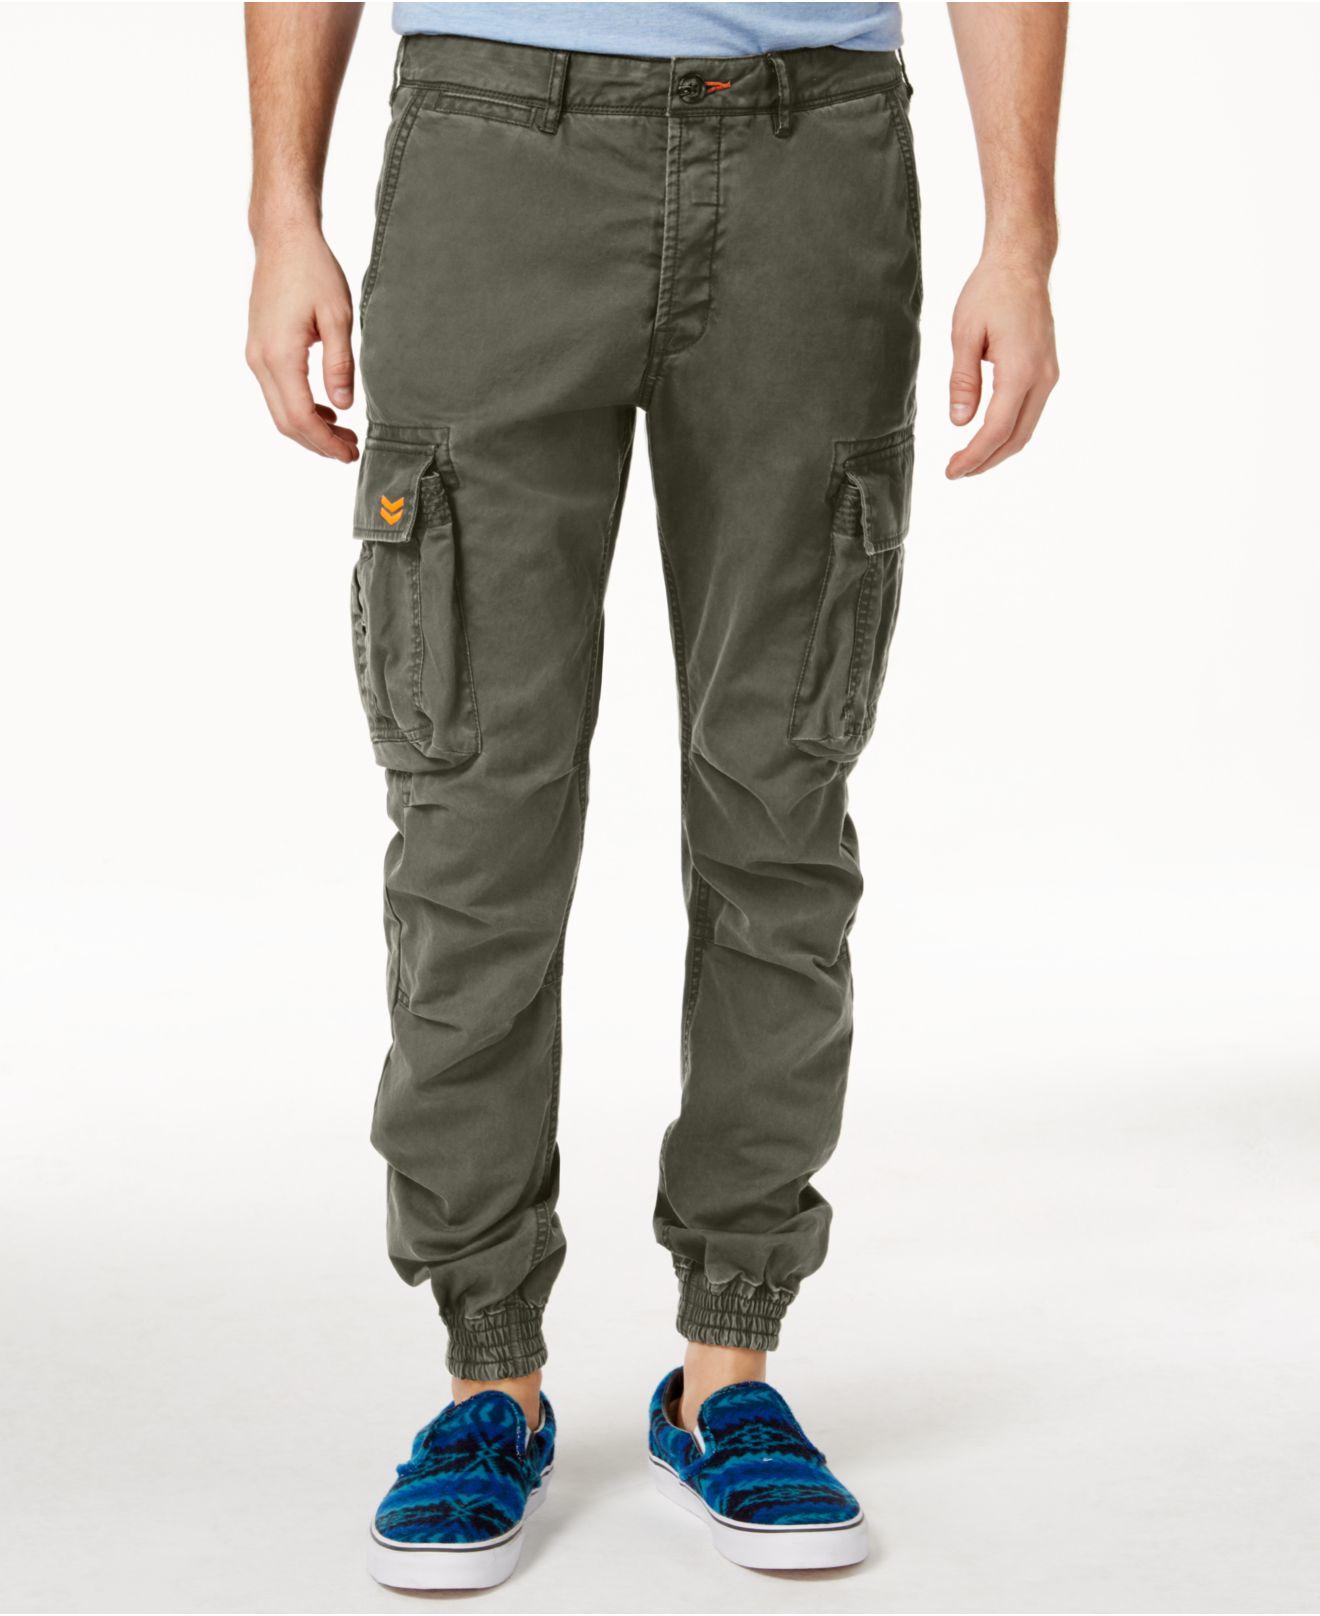 Superdry Men's Rookie Grip Camouflage Cargo Pants